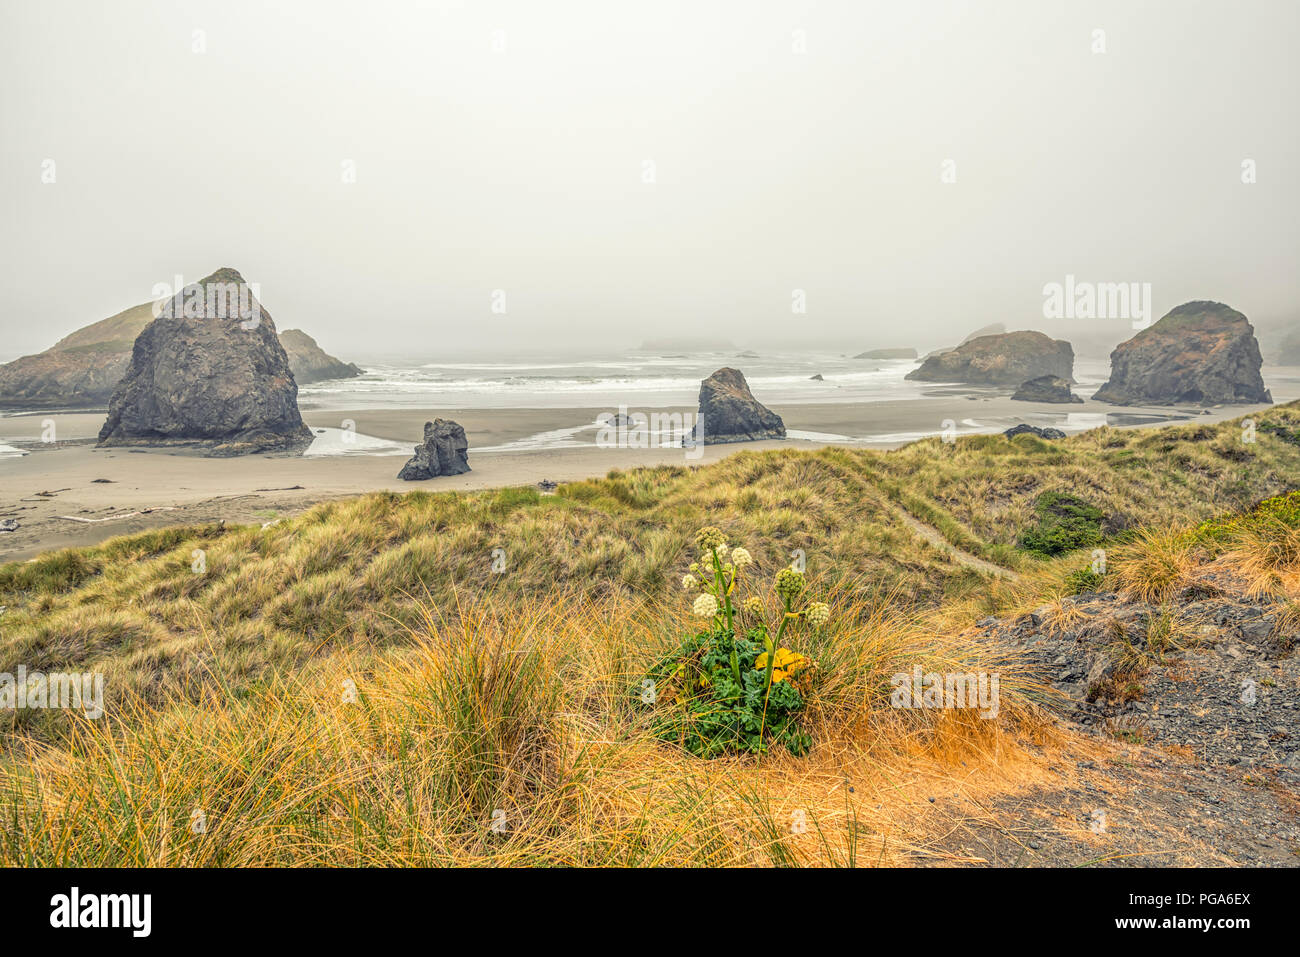 Meyers Beach. Pistol River Scenic Viewpoint.  Southern Oregon coast, USA. - Stock Image